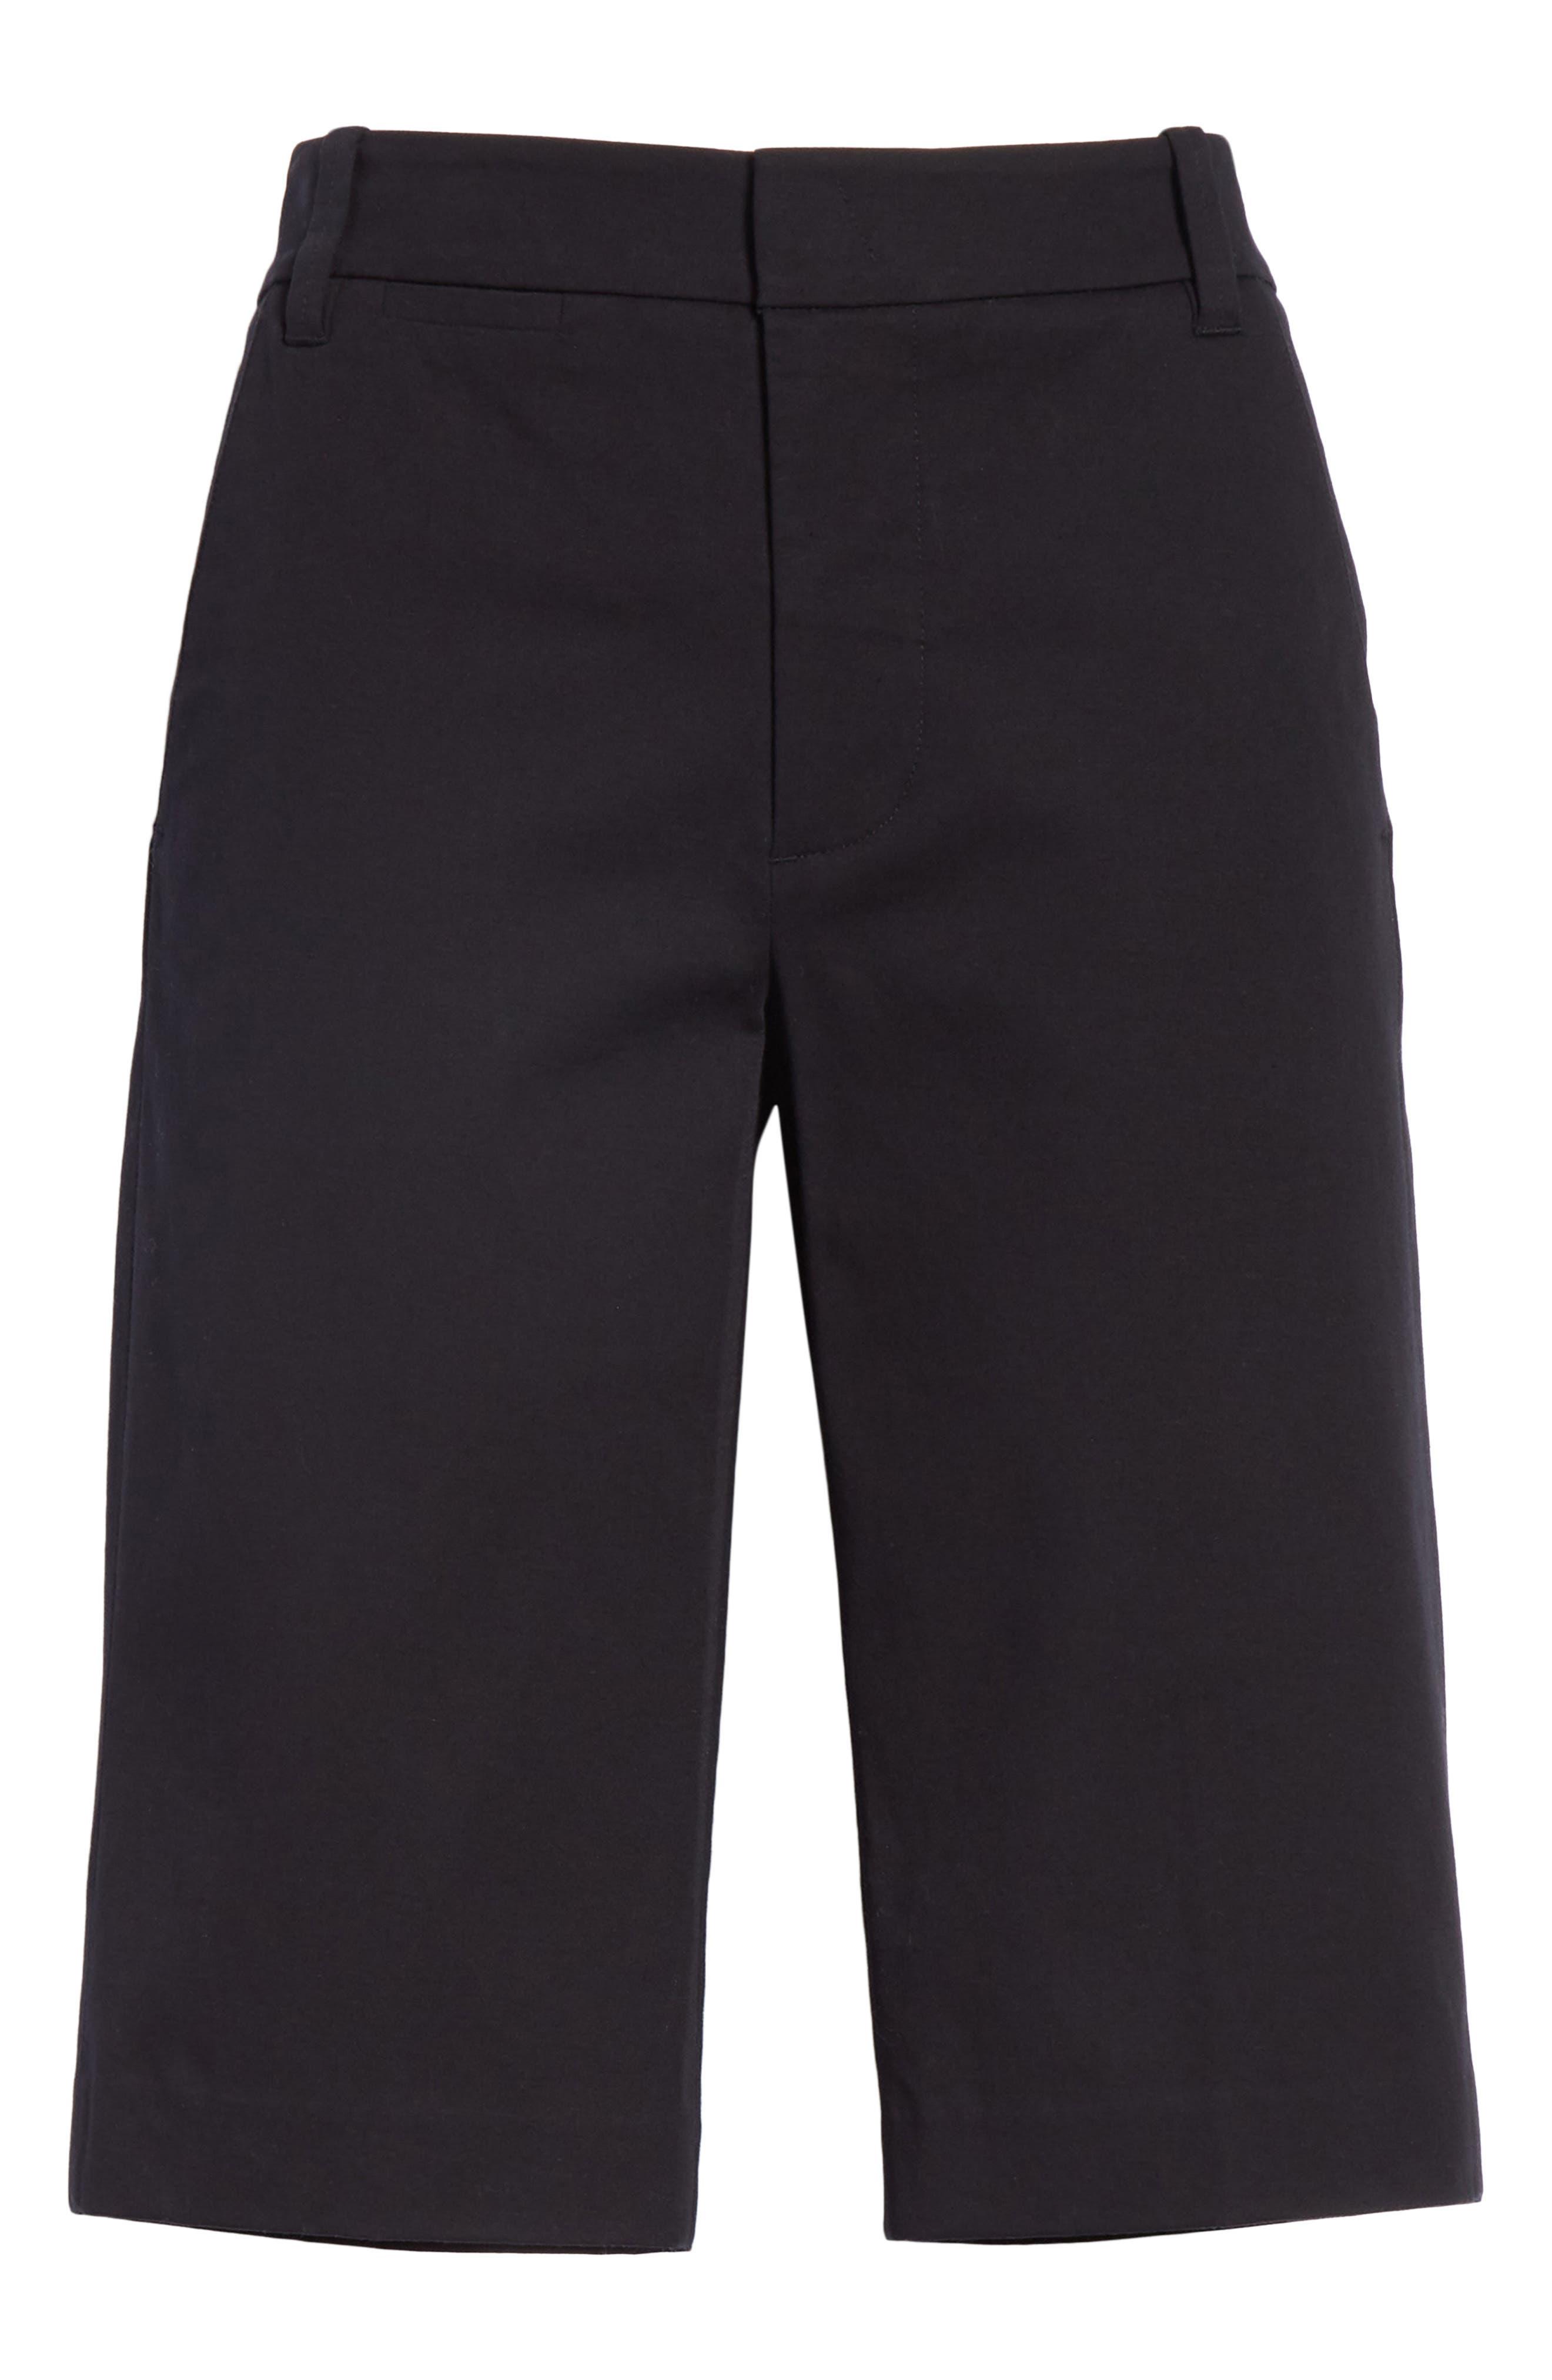 Bermuda Shorts,                             Alternate thumbnail 6, color,                             Black